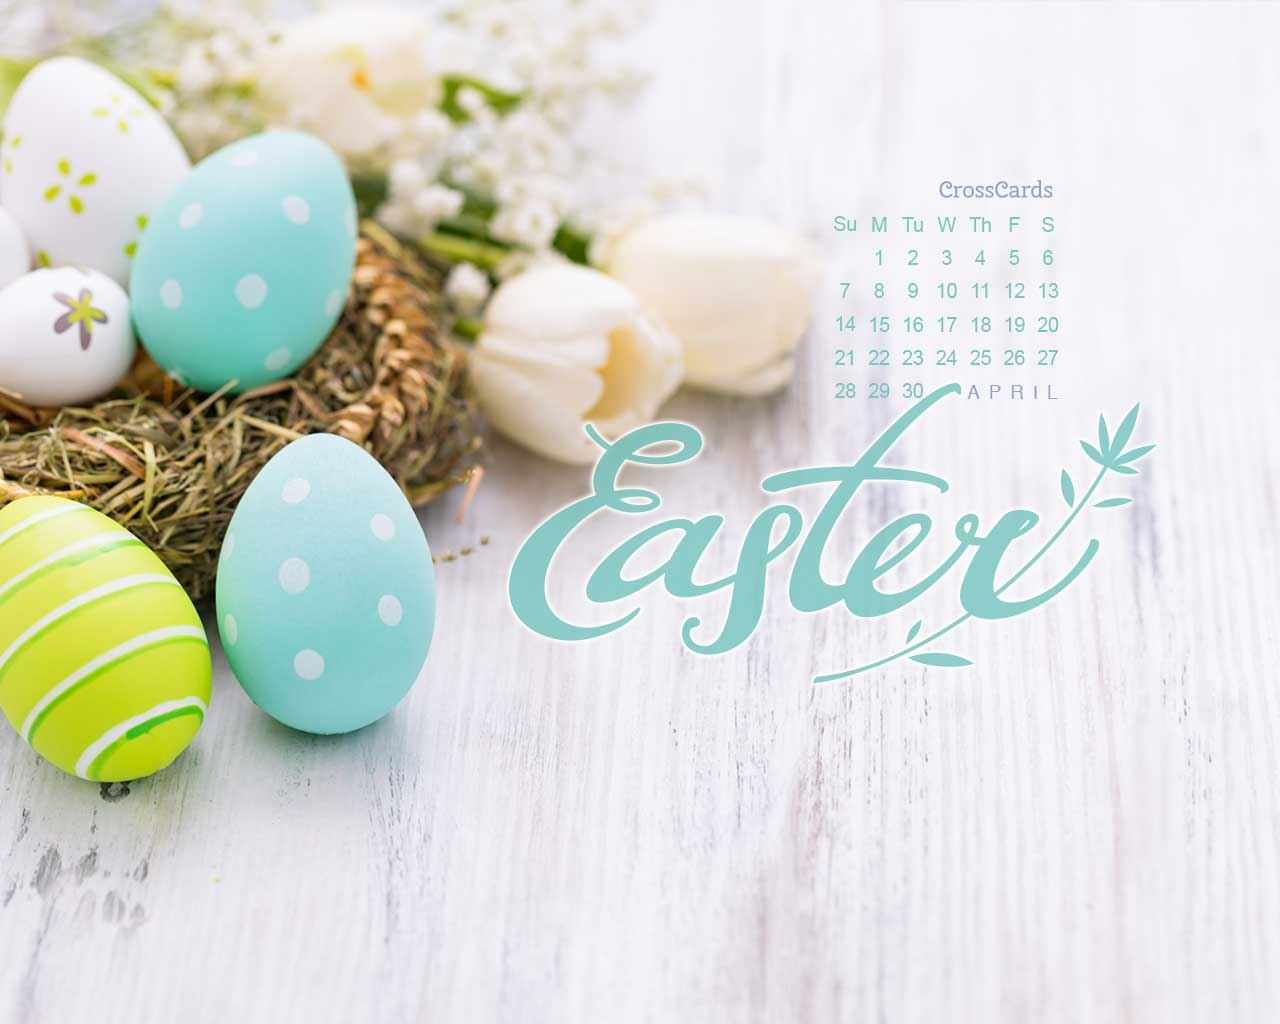 April 2019 Easter Eggs Desktop Calendar Free April Wallpaper